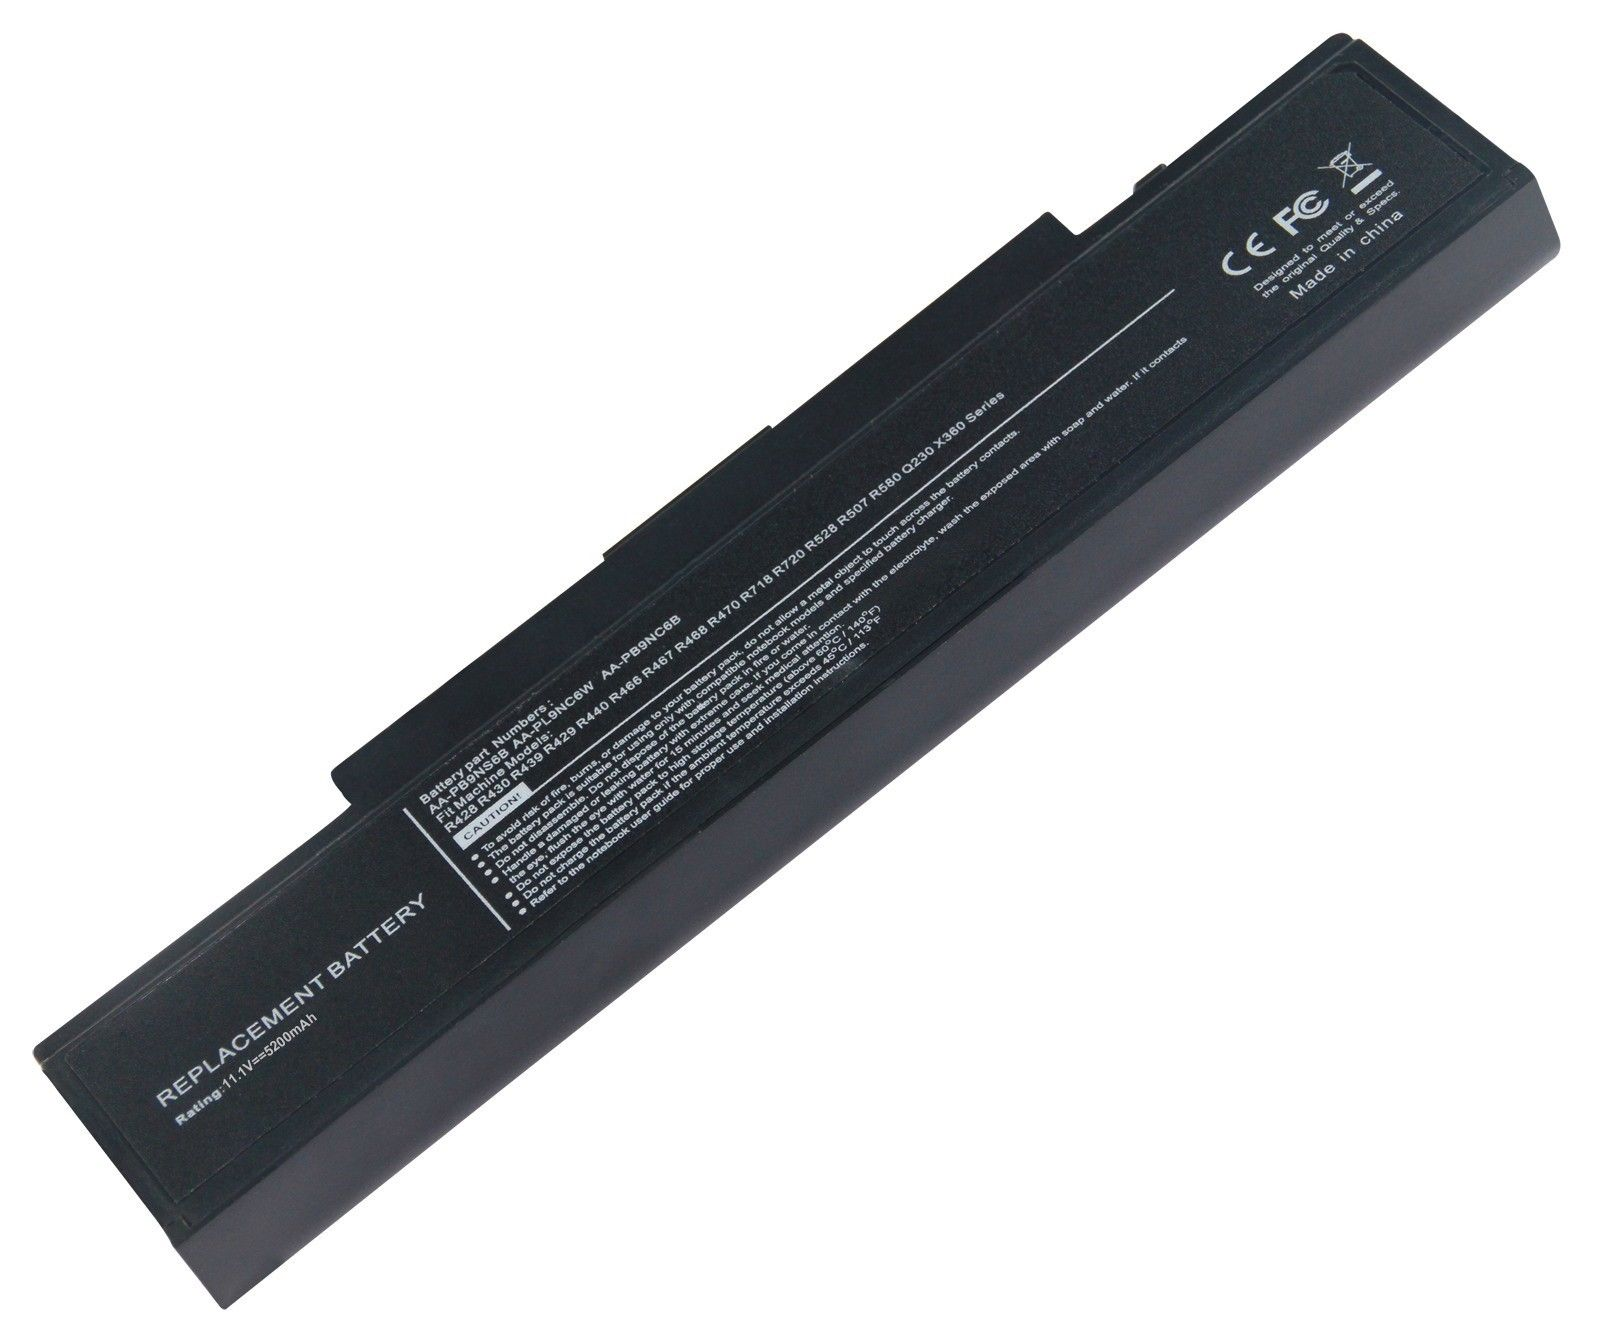 Battery For Samsung R580 R425 AA-PB9NC6B AA-PB9NC5B AA-PB9NS6B AA-PL9NC6W AA-PB9NS6W AA-PL9NC6B R428 R429 R468 RV520 RU свитшот print bar innorma aa